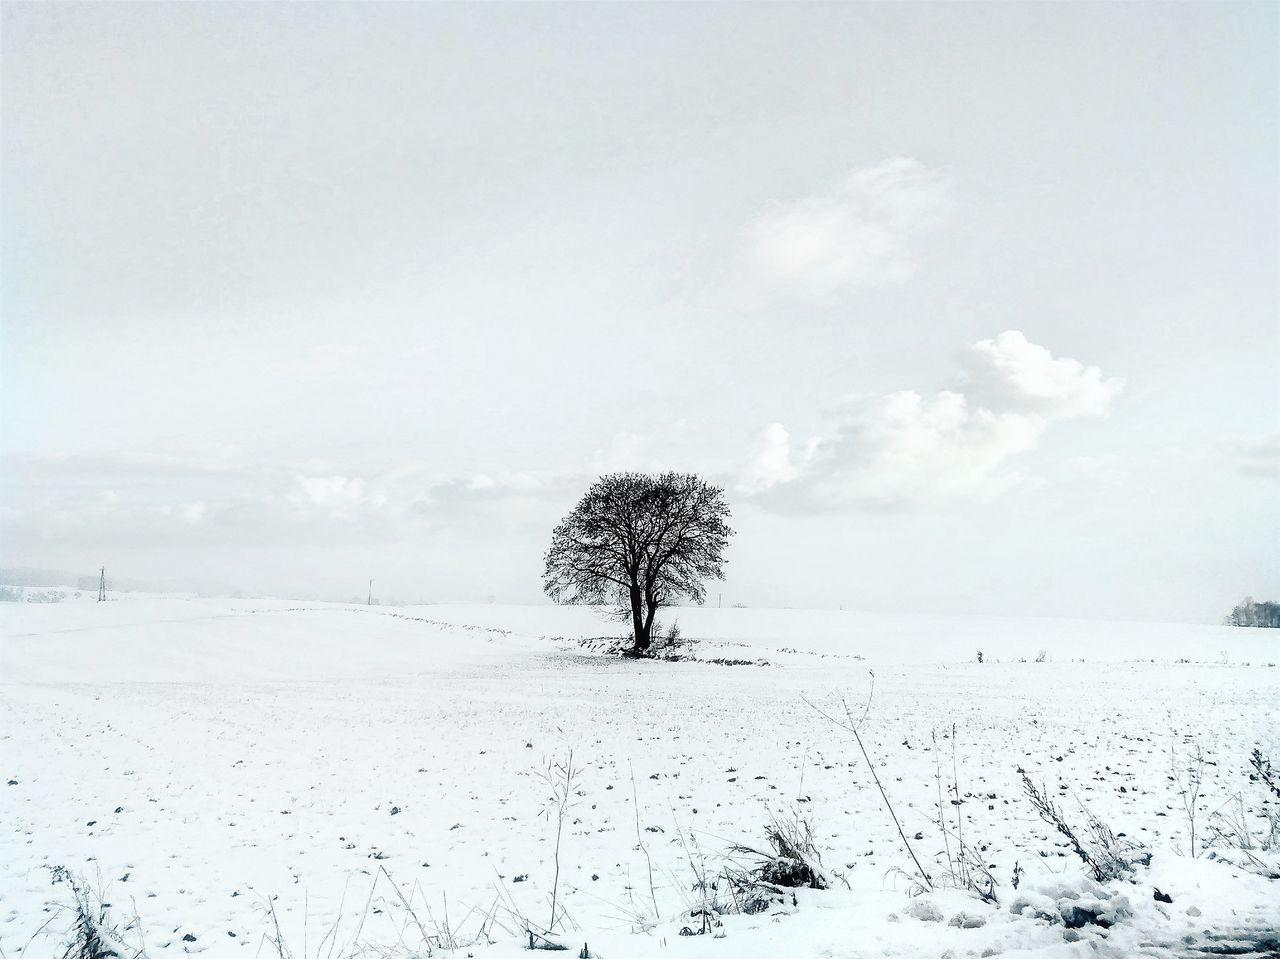 Nature No People Outdoors Science Landscape Day Sky Tree Polska Poland Warmia Drzewo Winter Zima